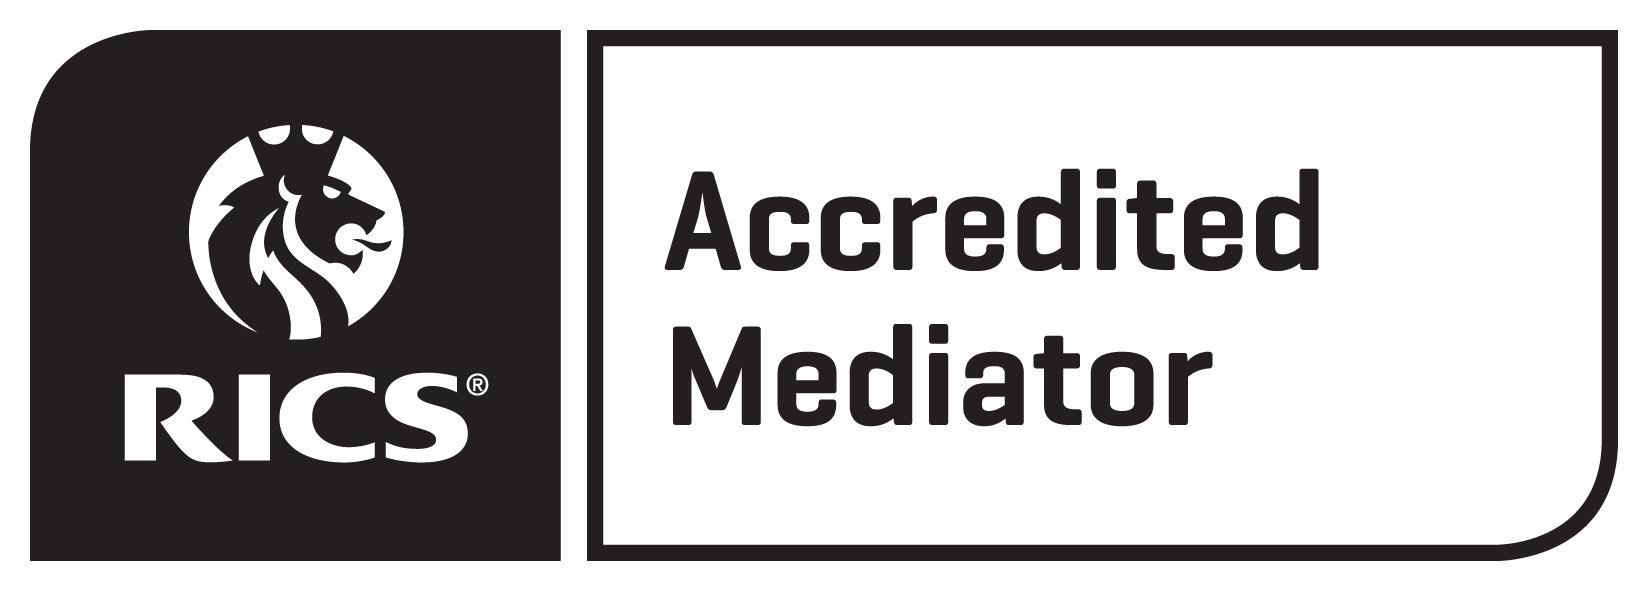 rics_accredited_mediator_logo1709_1648_04